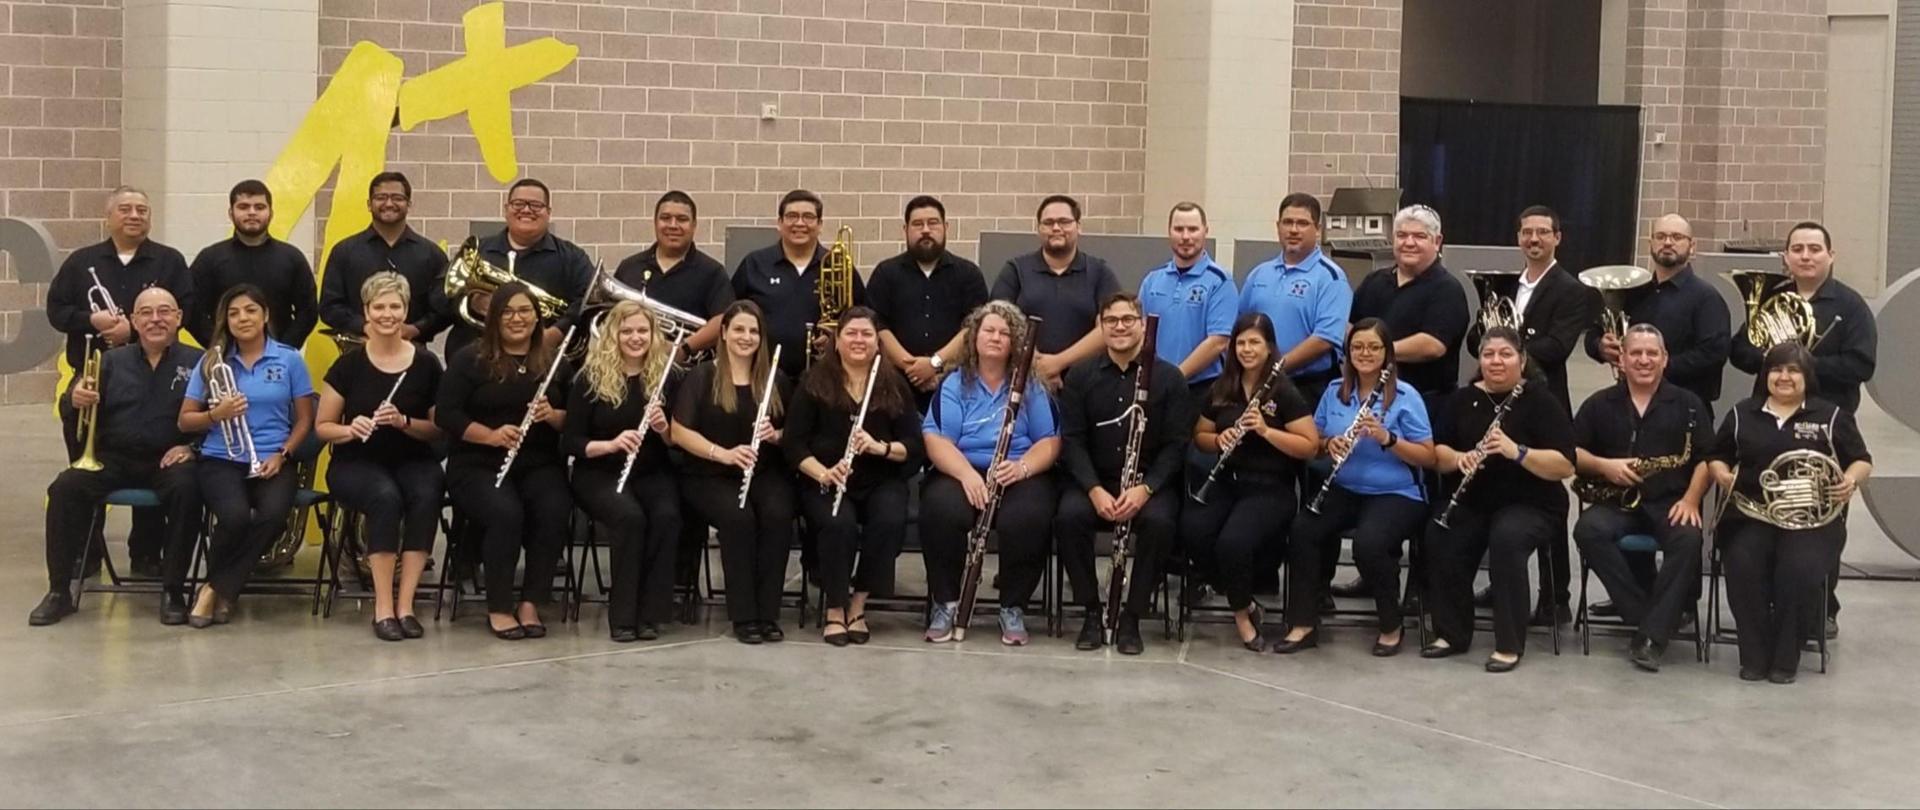 2019-2020 MISD Band Directors